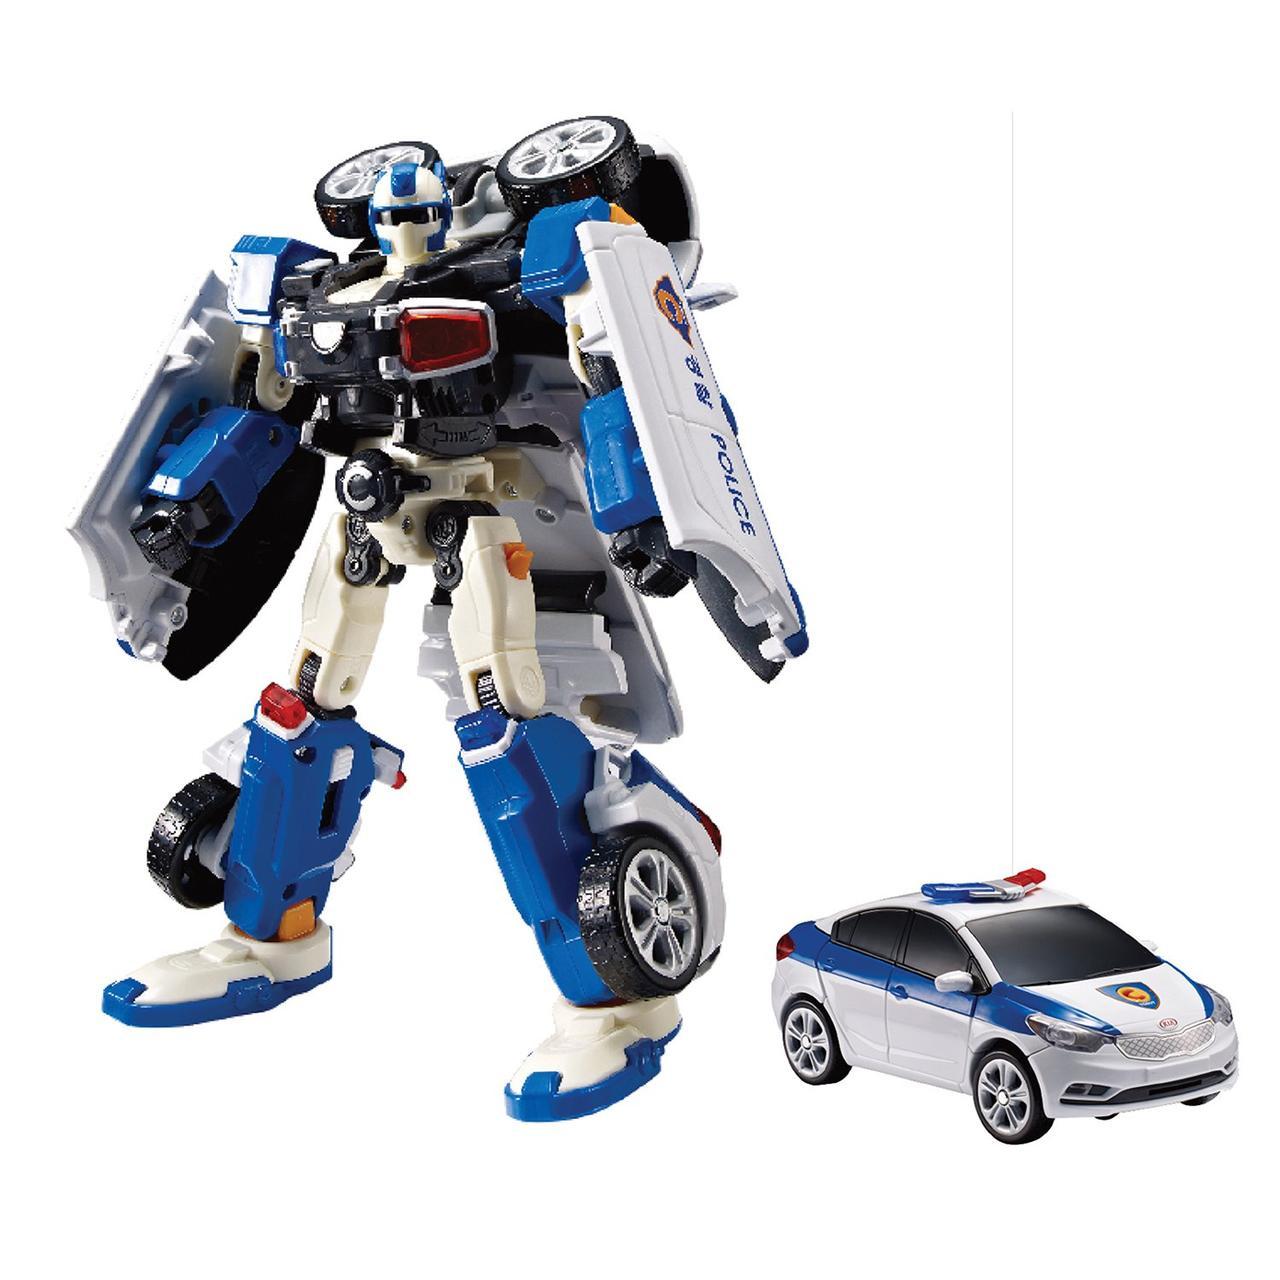 Іграшка-трансформер Tobot Rescue Поліція C 301014